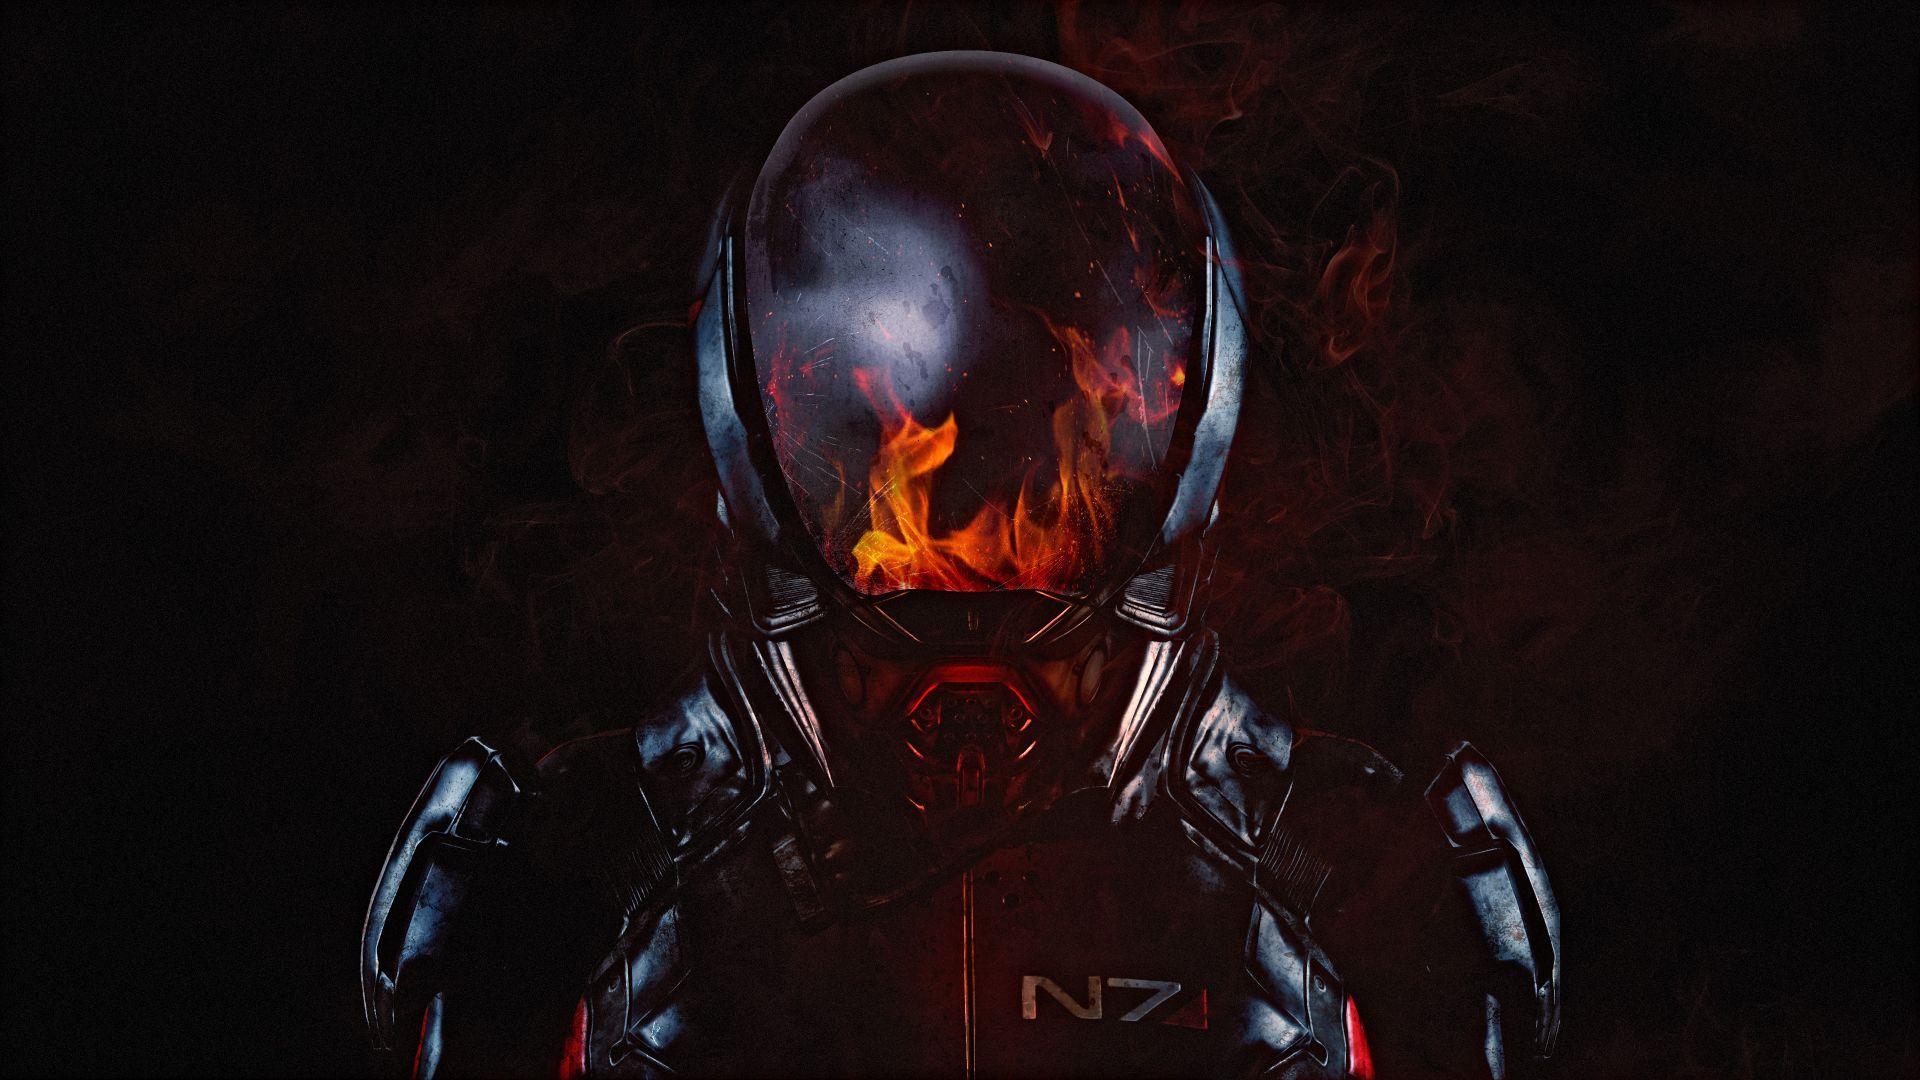 Wallpaper Mass Effect: Andromeda, 2017 game, N7, soldier, flame on helmet, 4k